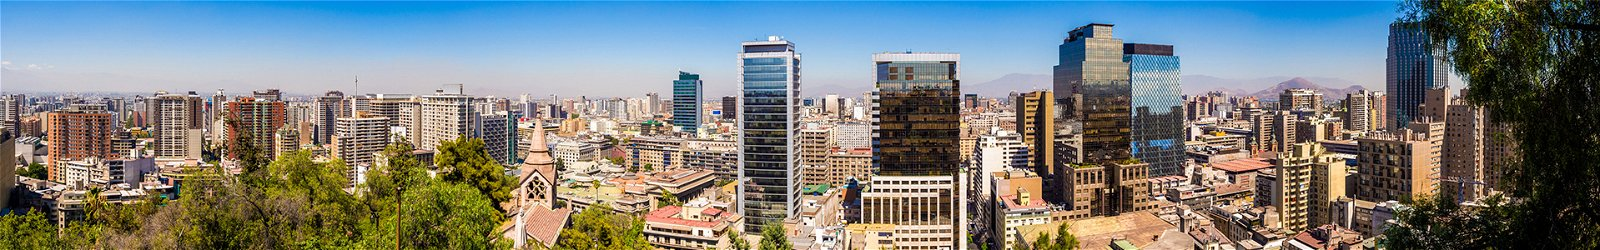 Viaje a Chile desde México 2020